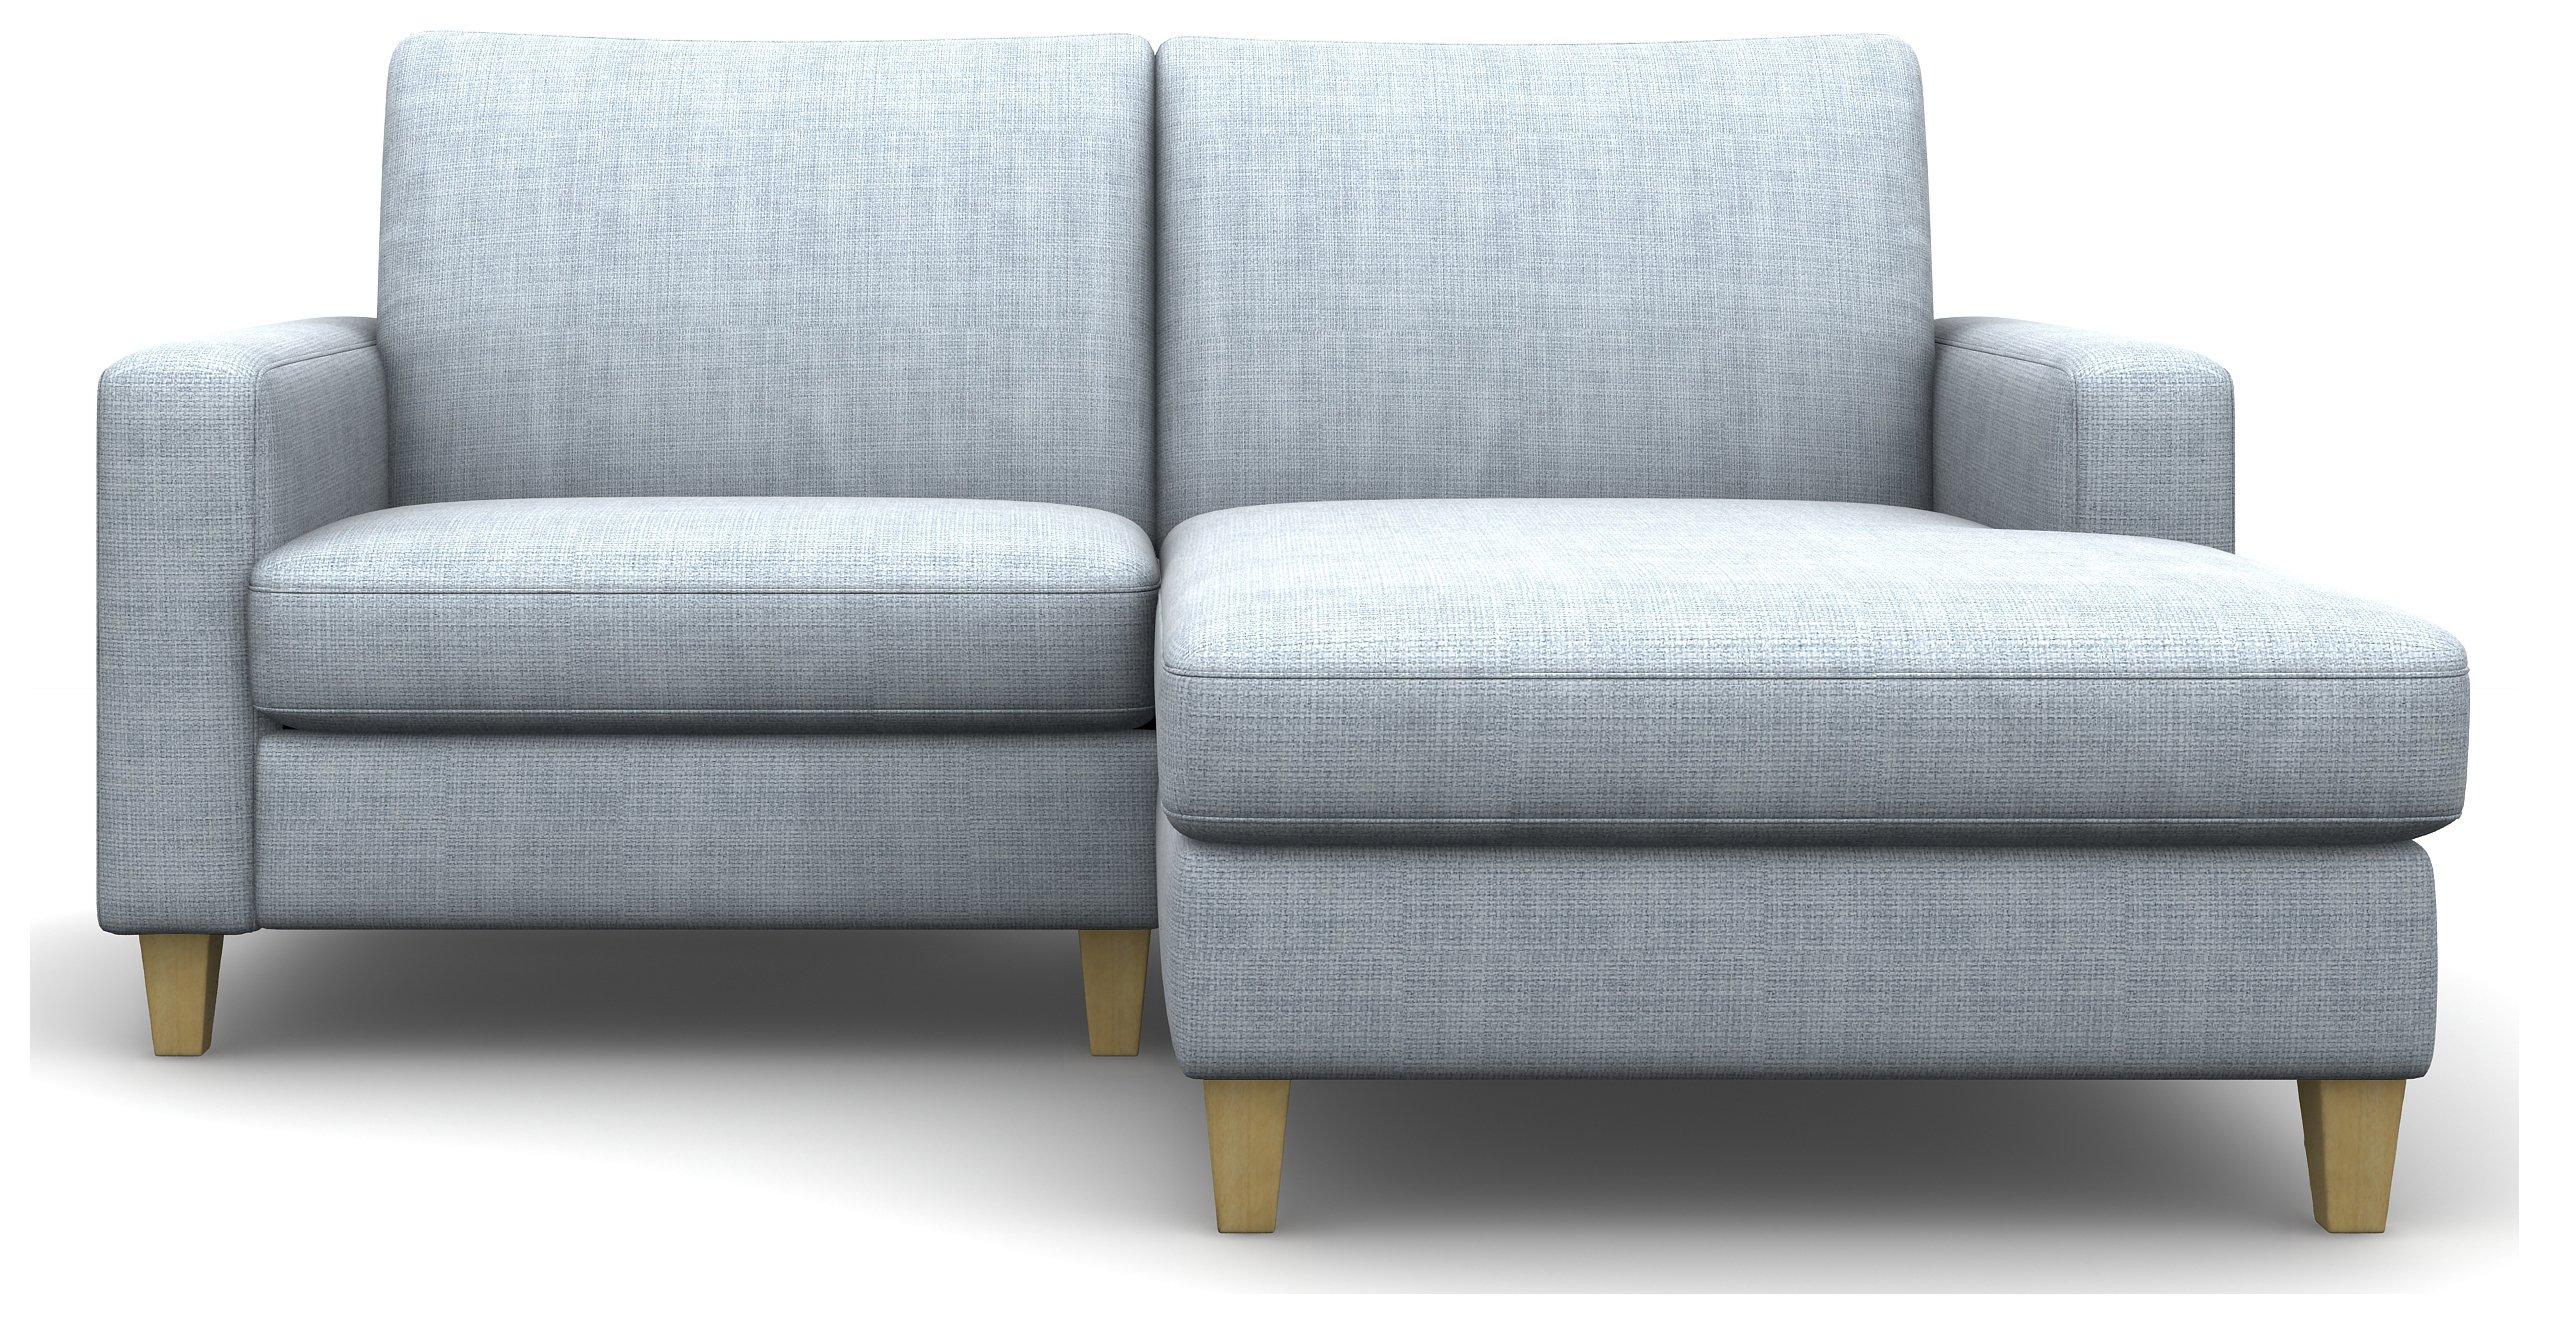 Heart of House Harrison Fabric Chaise Sofa - Sky.